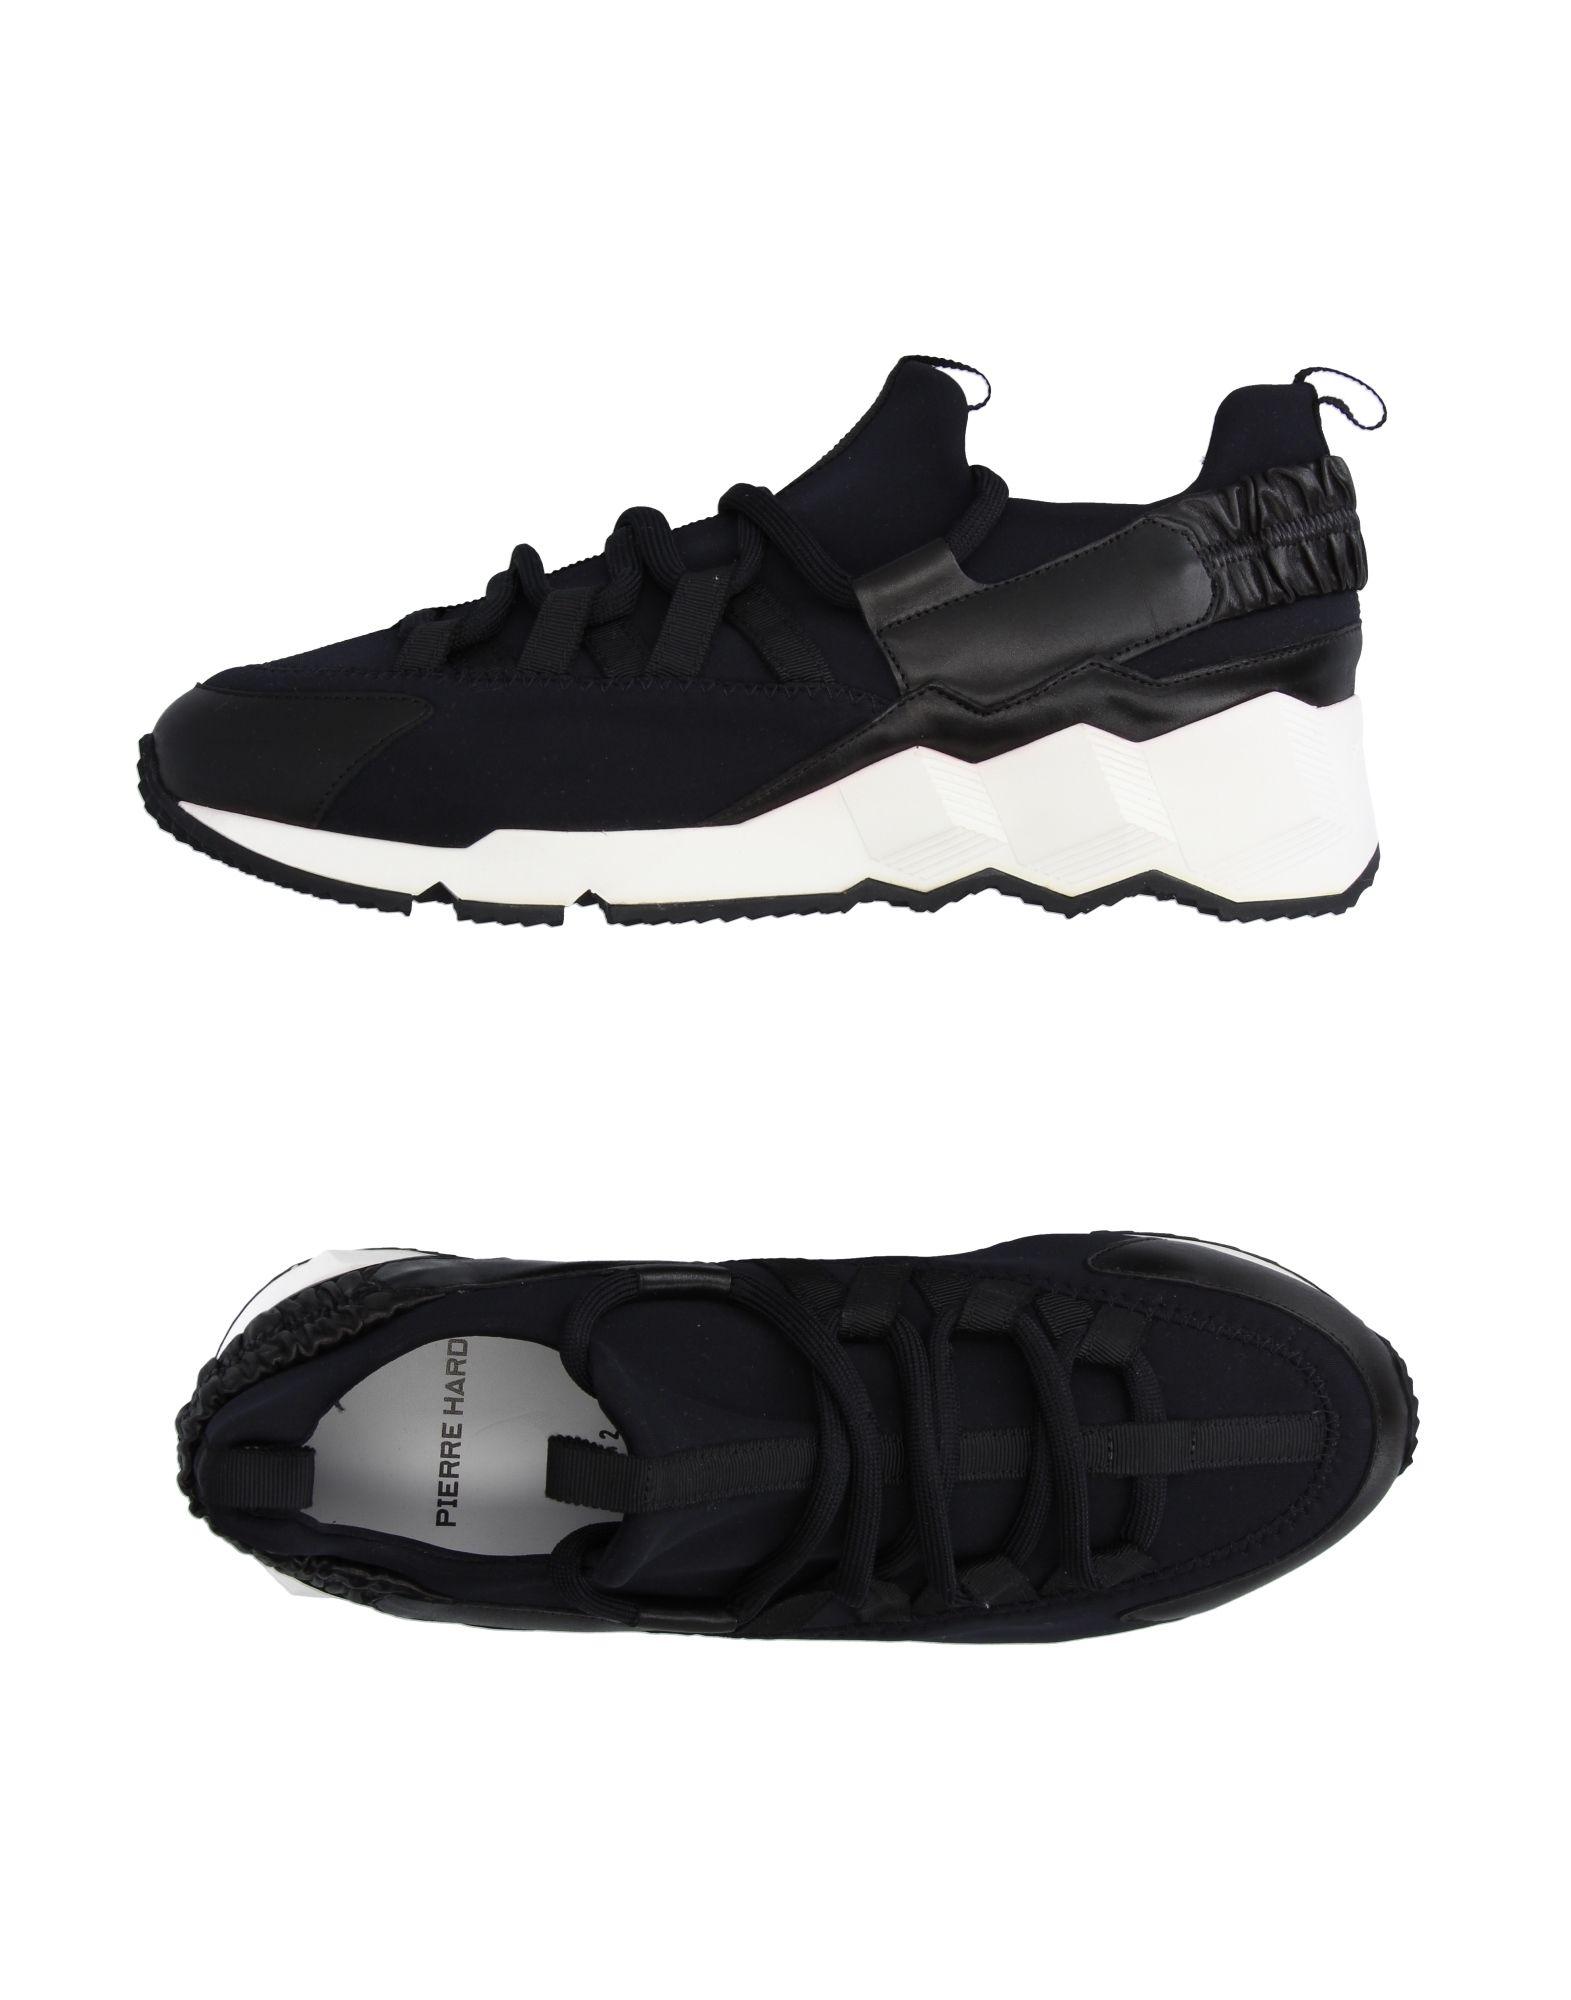 Pierre Hardy Sneakers Herren  11215587VK Gute Qualität beliebte Schuhe